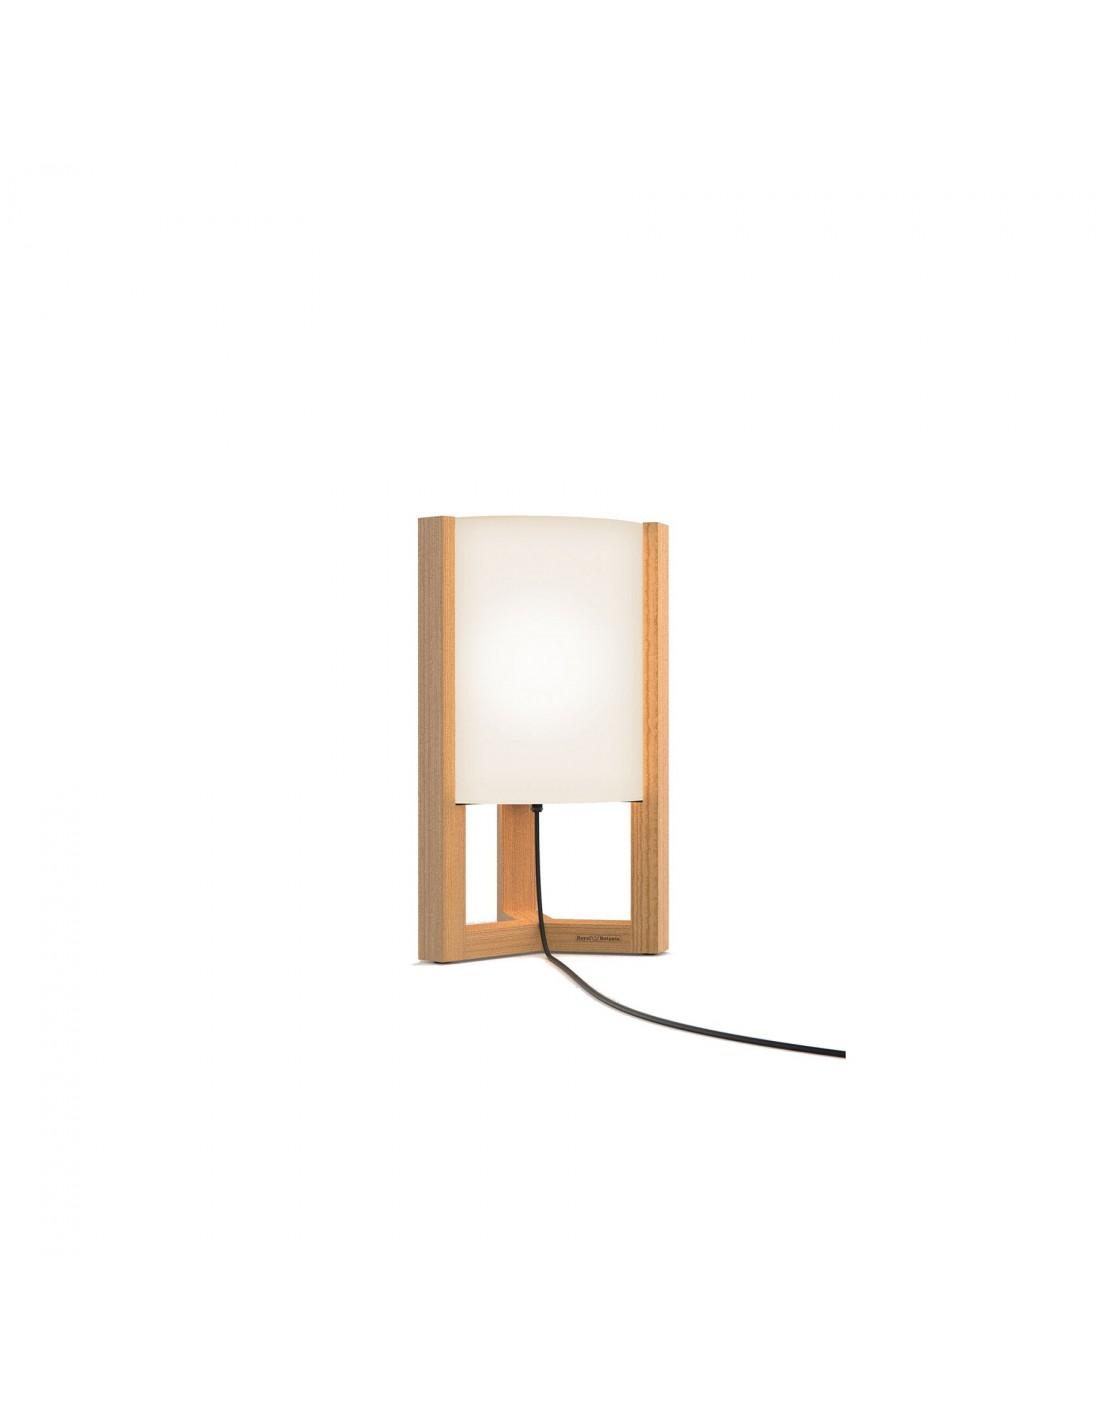 Lampe à poser Tristar Hauteur 45cm - Valente Design